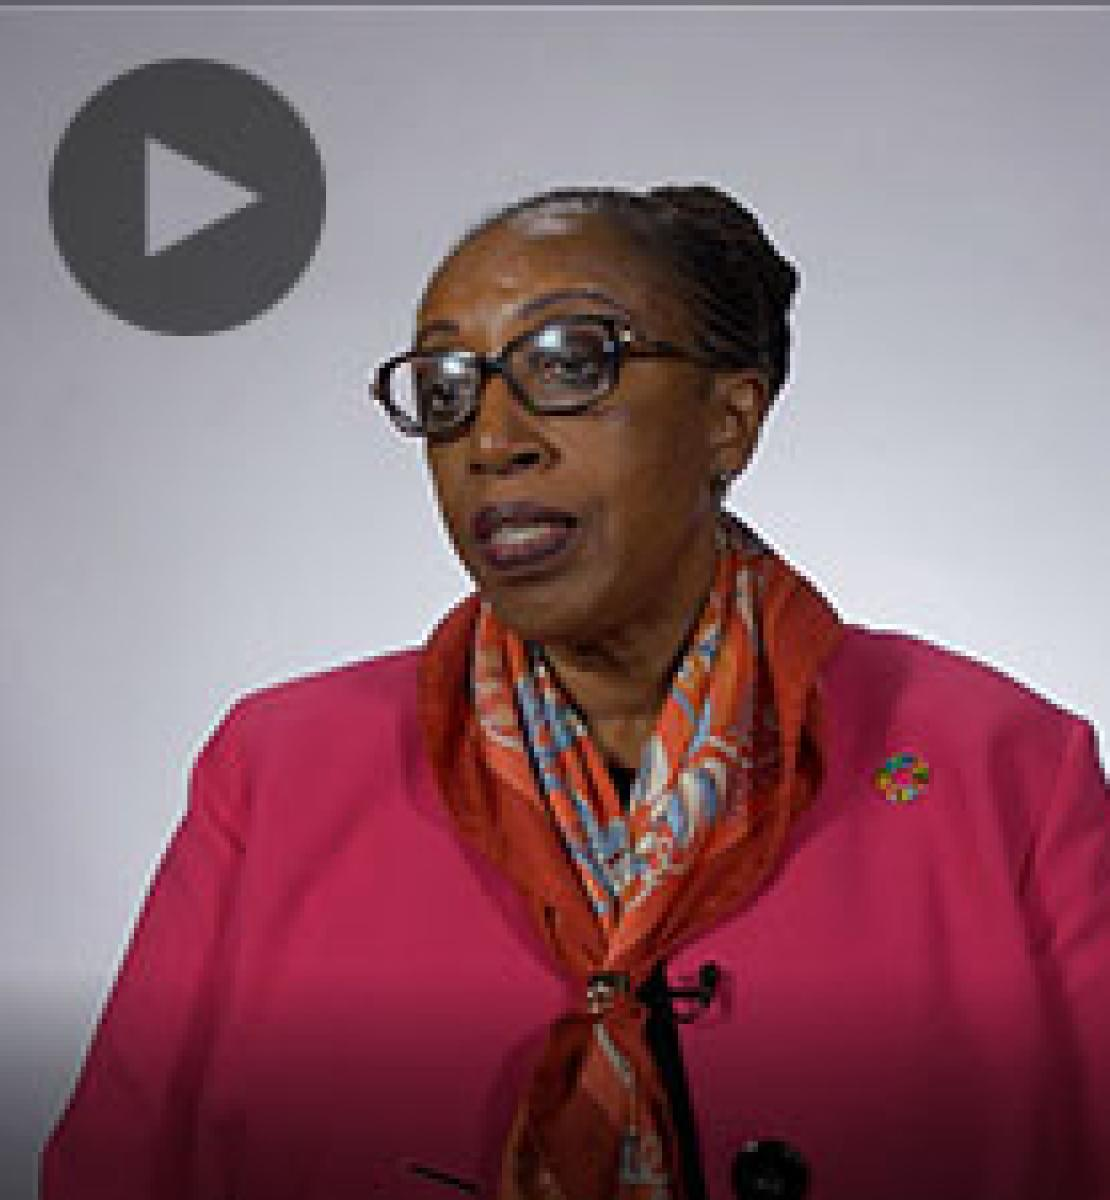 Screenshot from video message shows Resident Coordinator, Mbaranga Gasarabwe